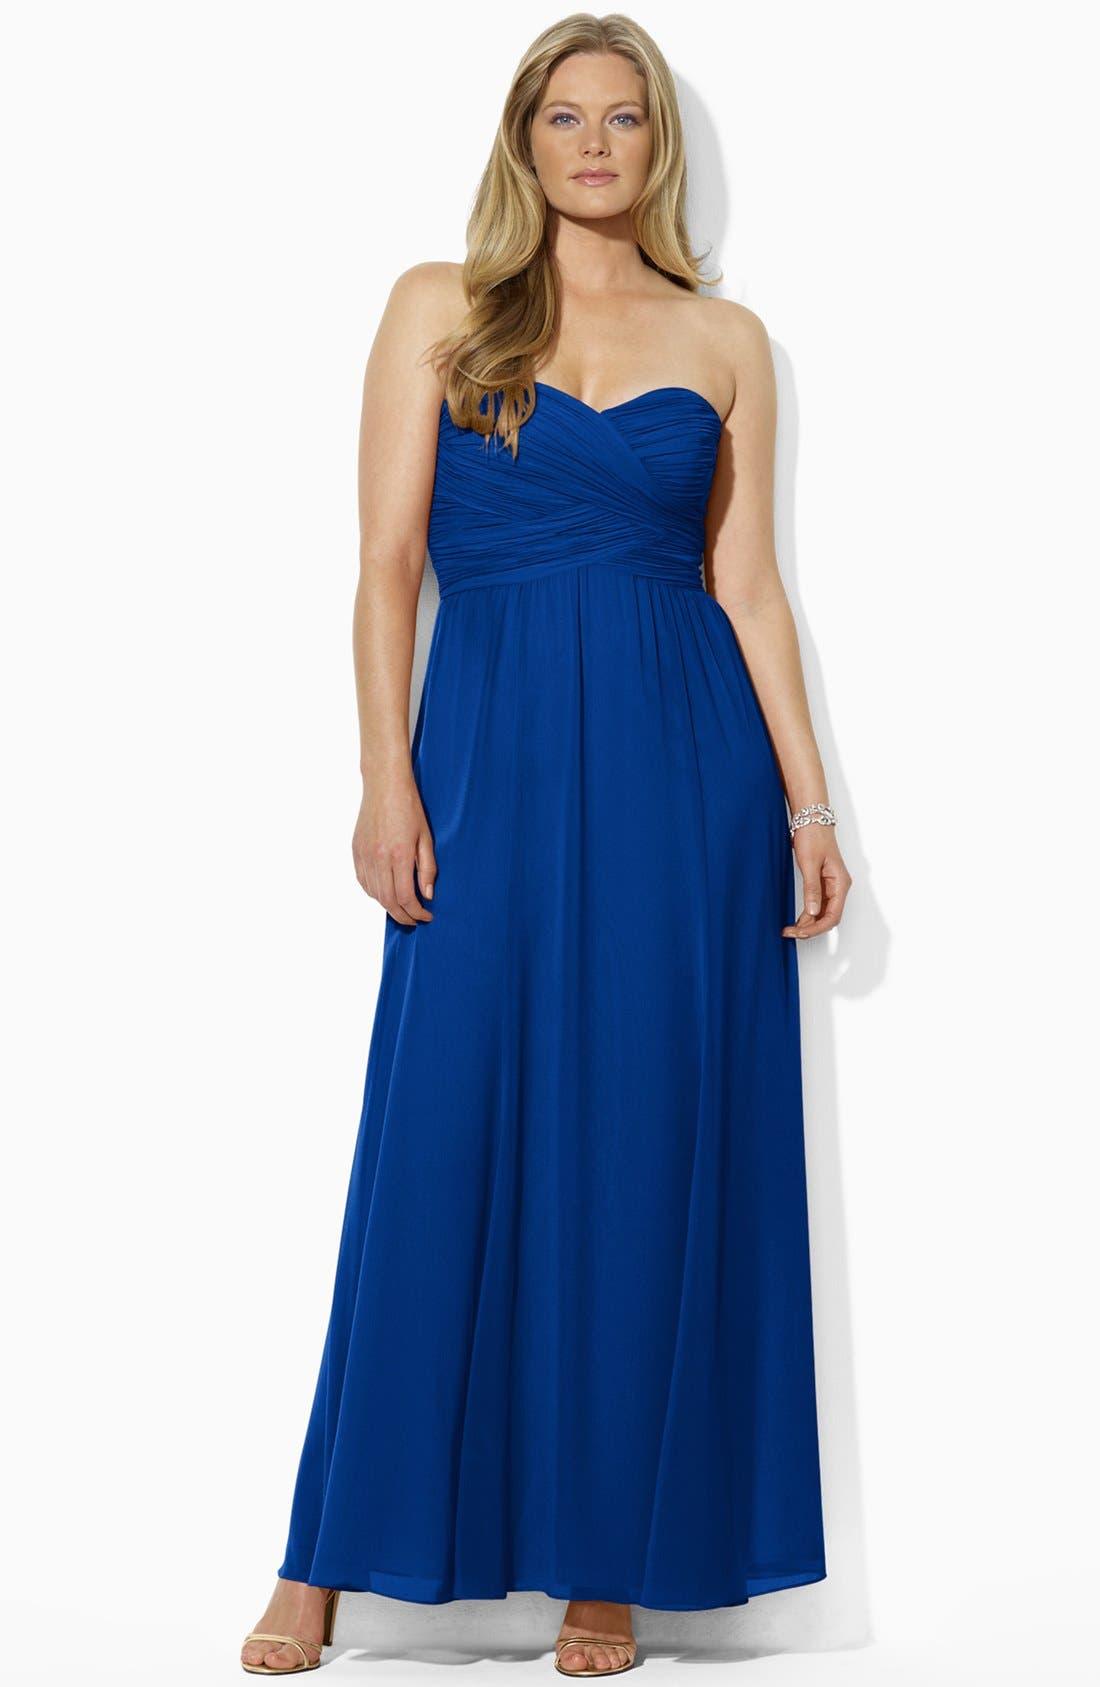 Main Image - Lauren Ralph Lauren Strapless Georgette Gown (Plus Size)